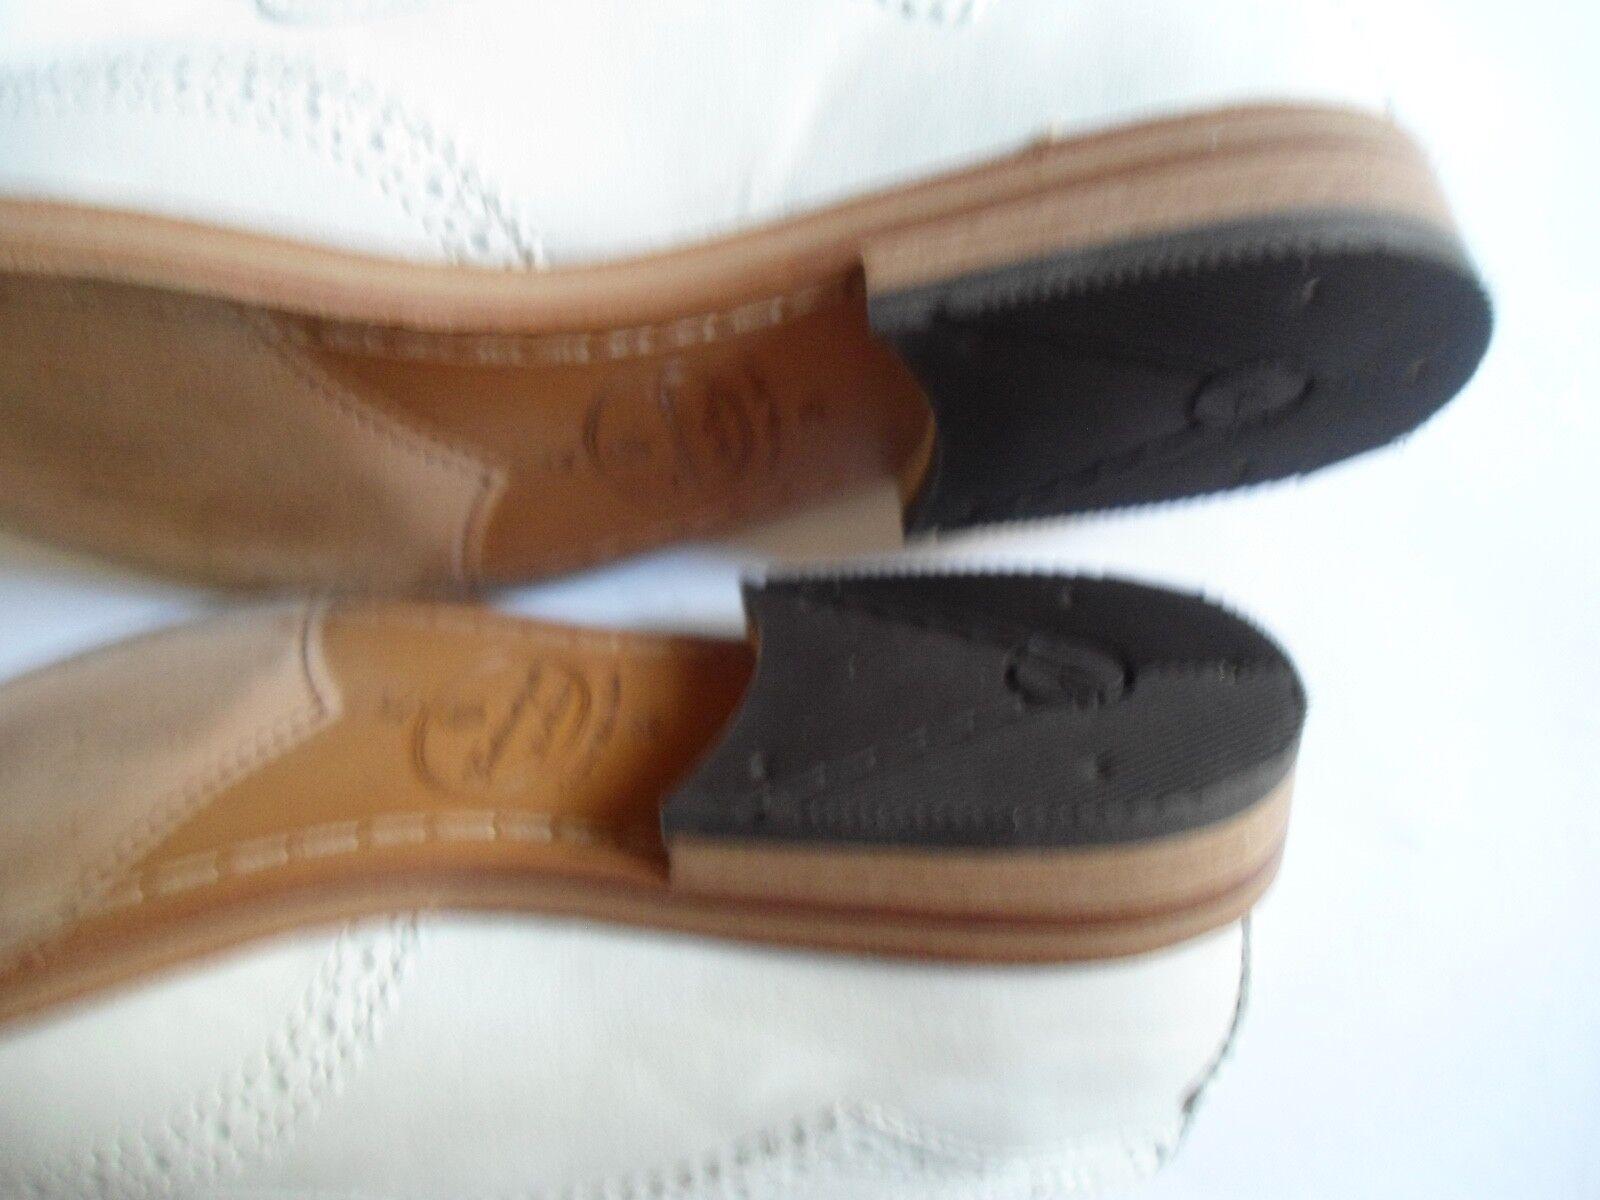 H by Hudson Damen Schuhe Größe Brogues 39 neuwertig Leder Budapester Brogues Größe hellgrau a6daf3